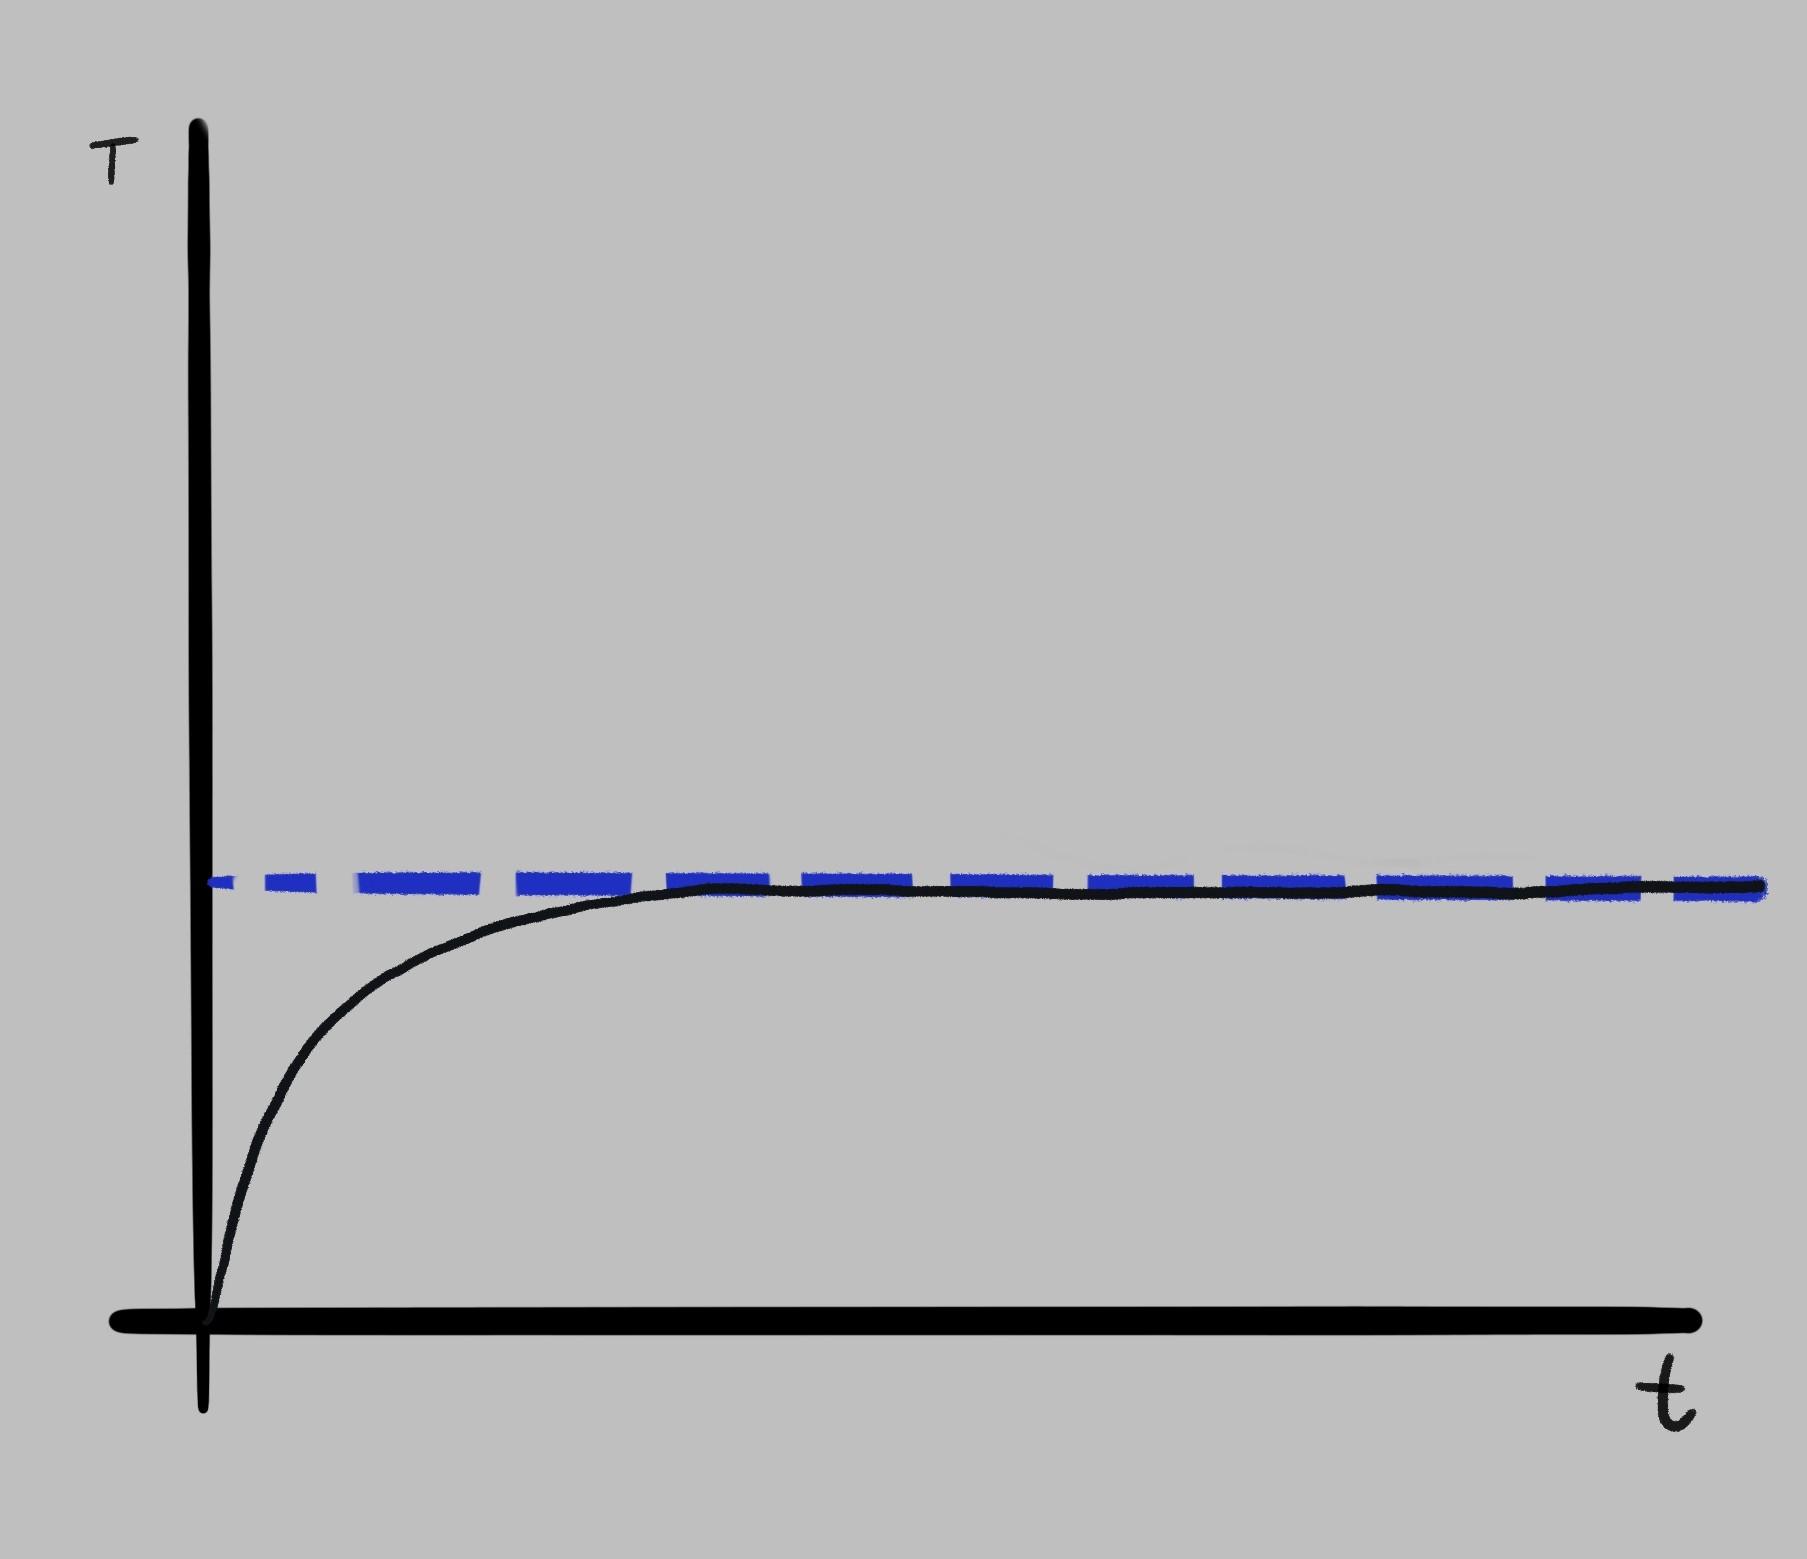 Graph - Open-loop oven experiment